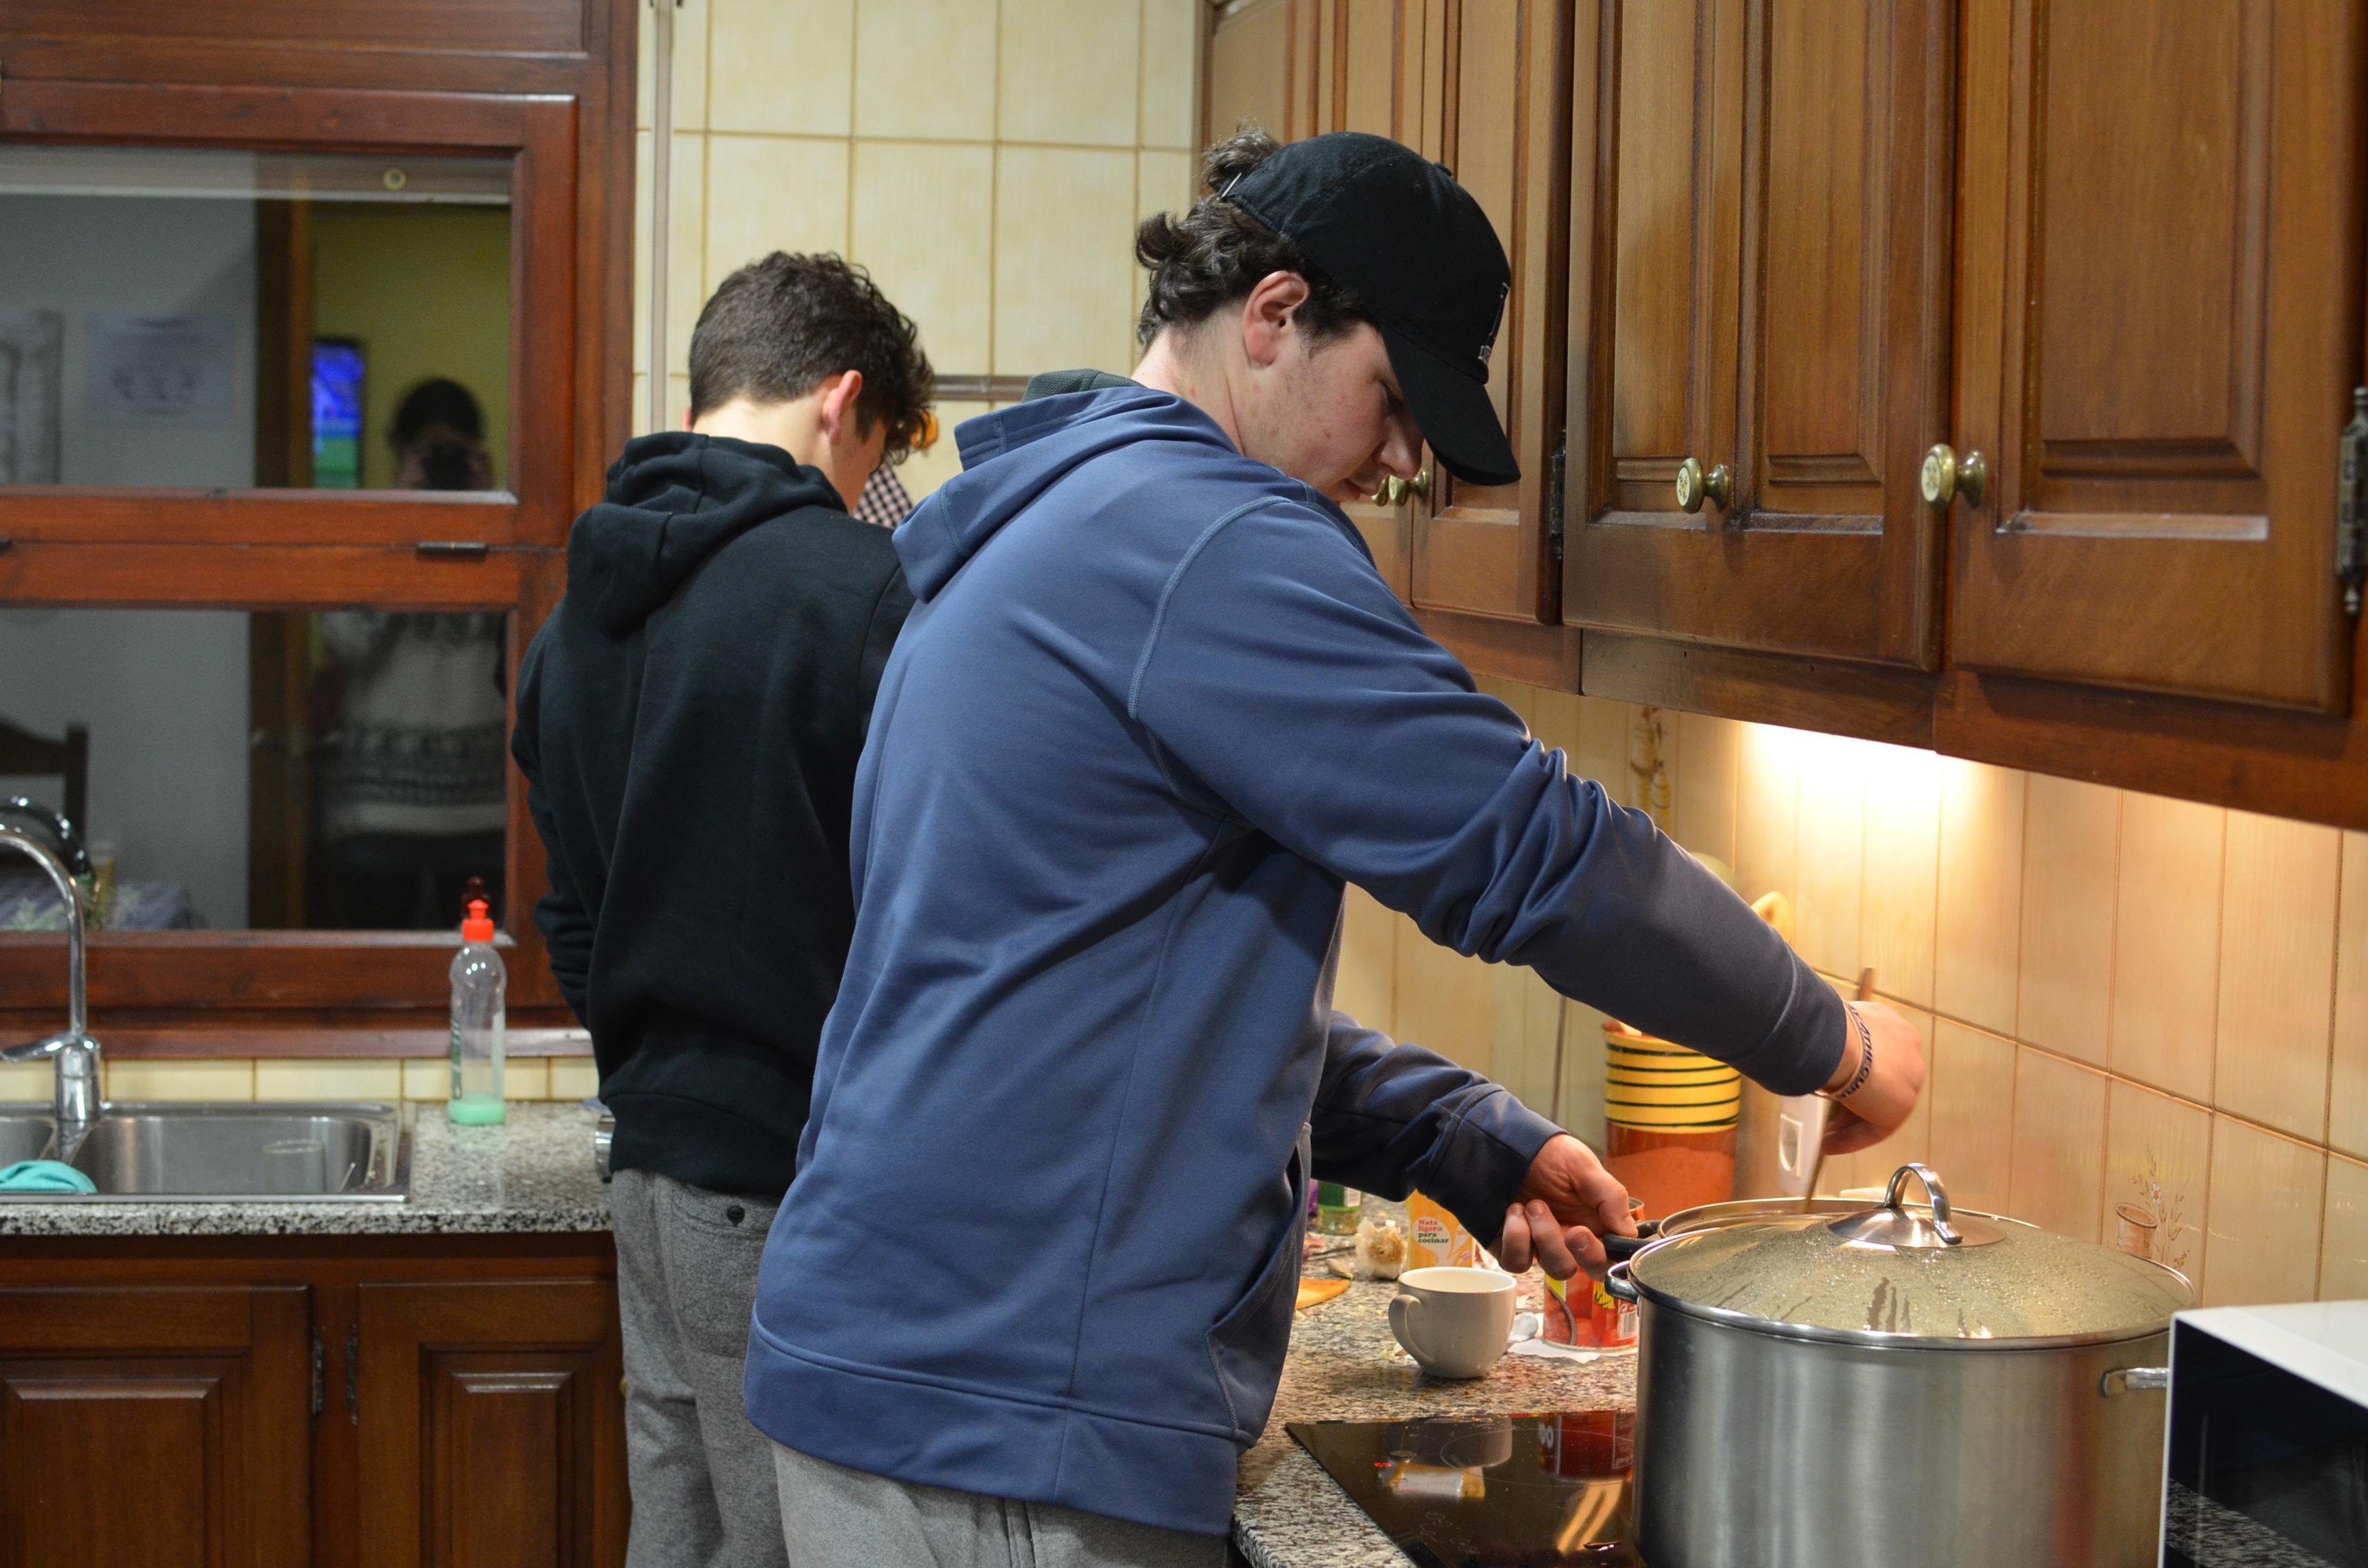 Proctor en Segovia cooks!